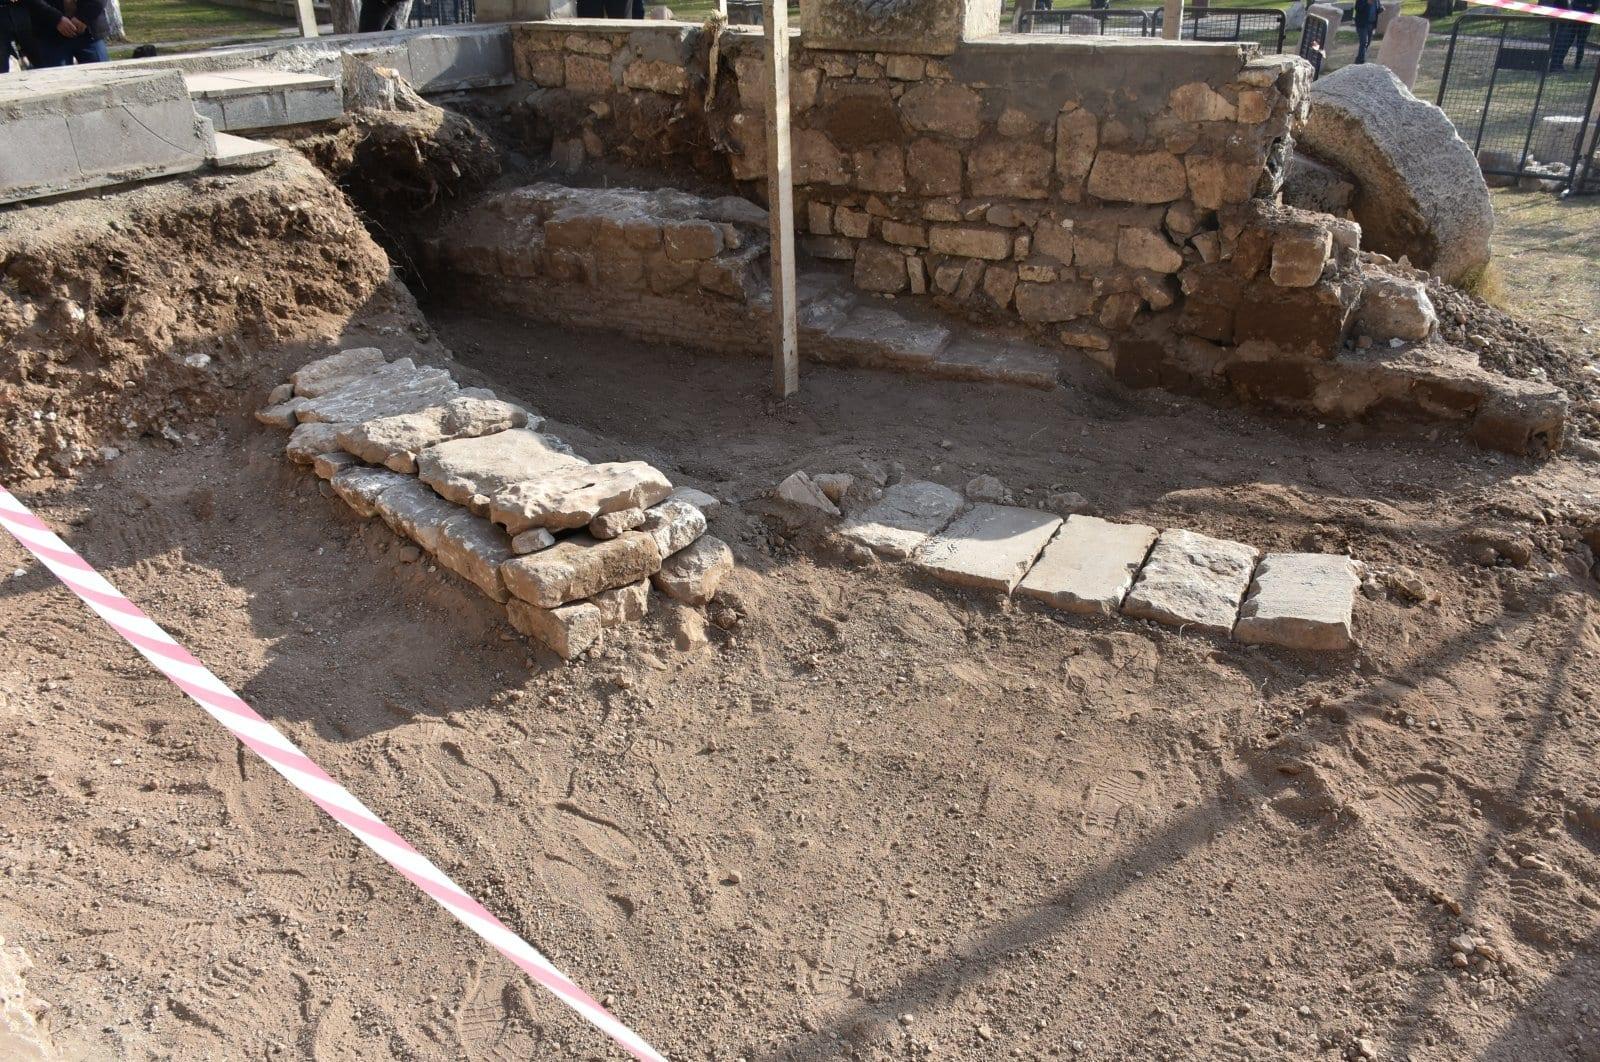 Graves of Anatolian Seljuk Sultan Kılıç Arslan I  and his daughter found in SE Turkey